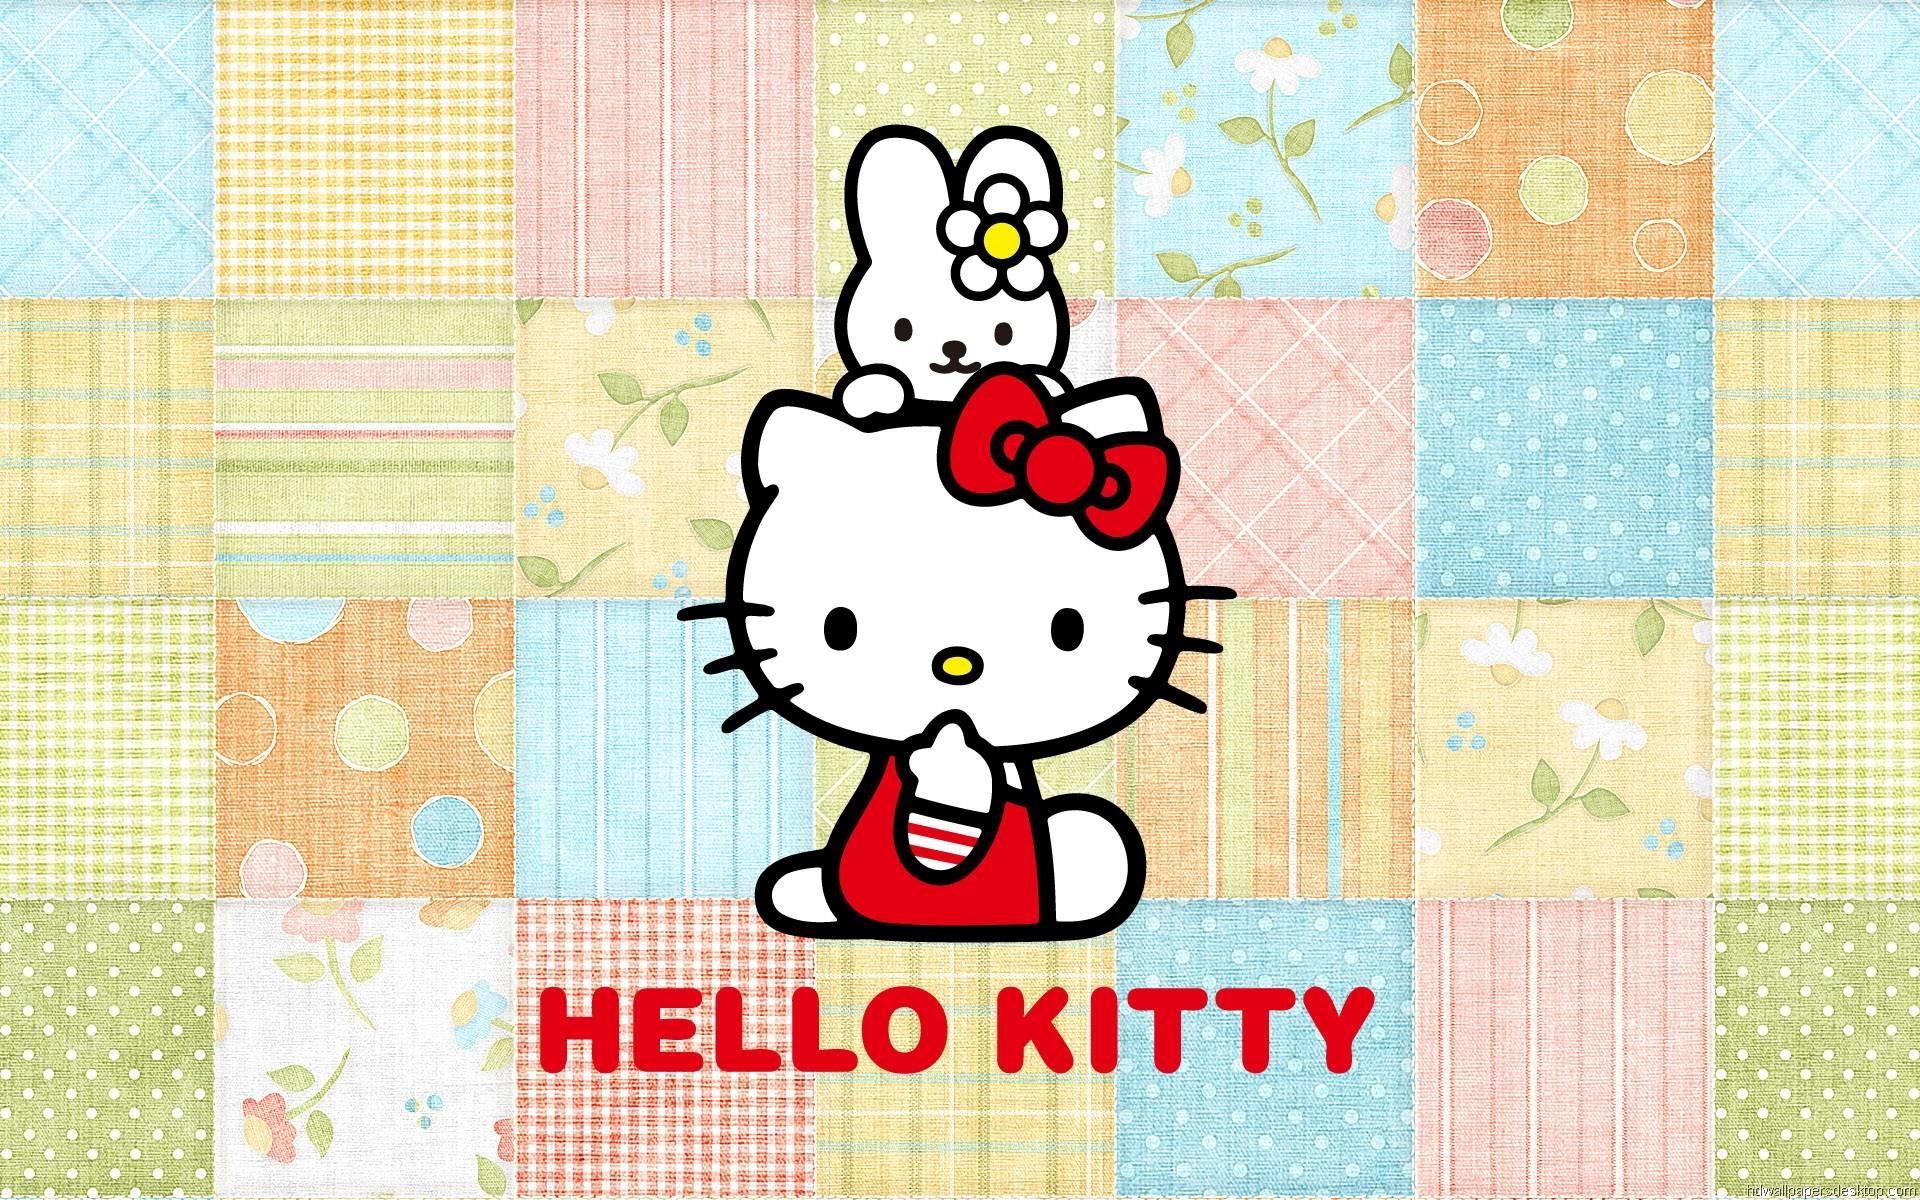 Best Wallpaper Hello Kitty Angel - 786679-download-hello-kitty-devil-wallpaper-1920x1200-hd-1080p  You Should Have_249956.jpg